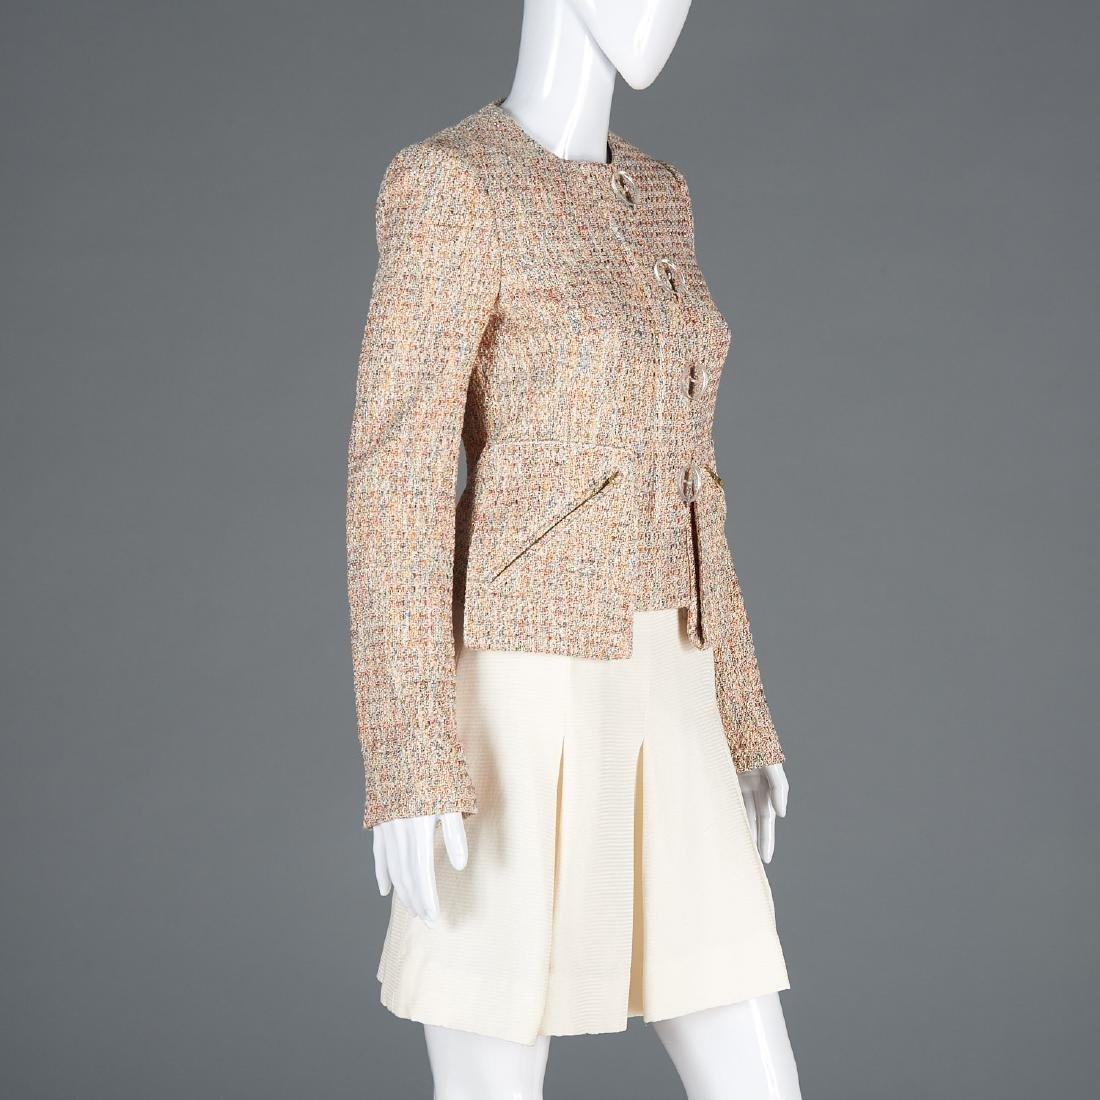 Tuleh cotton blend jacket and silk blend skirt